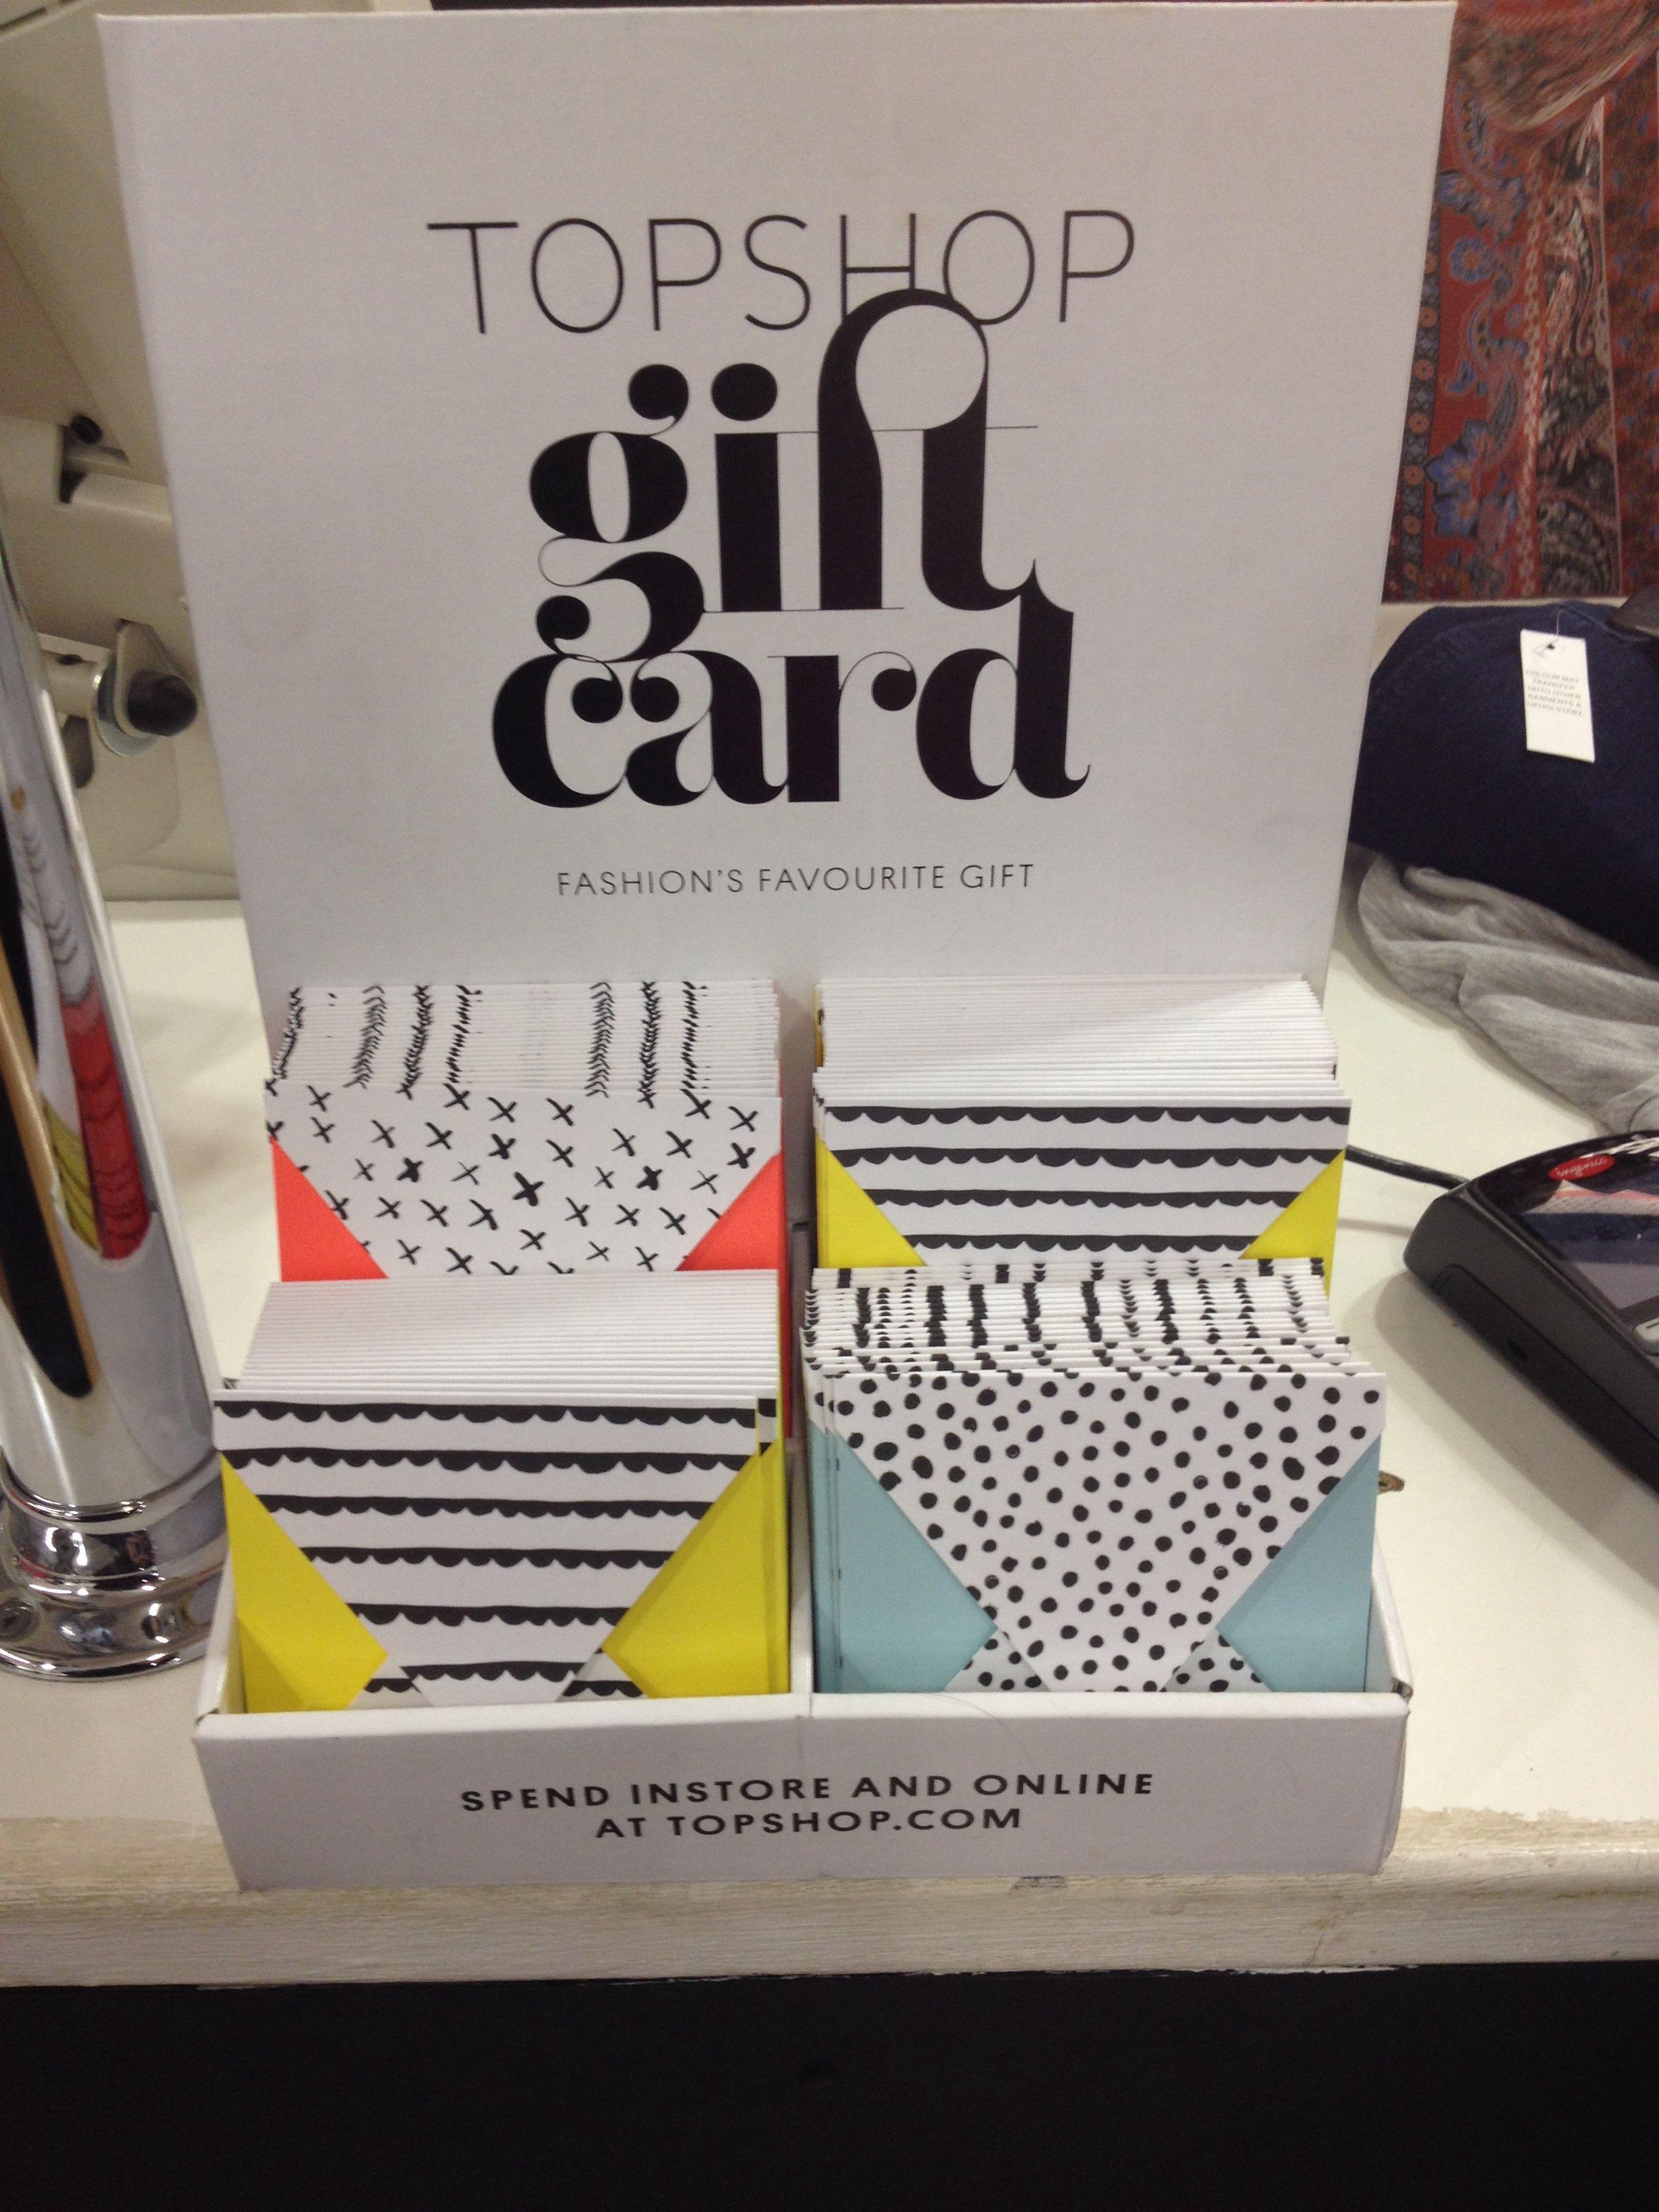 Topshop Gift Card Standard Love Top Shop Graphics